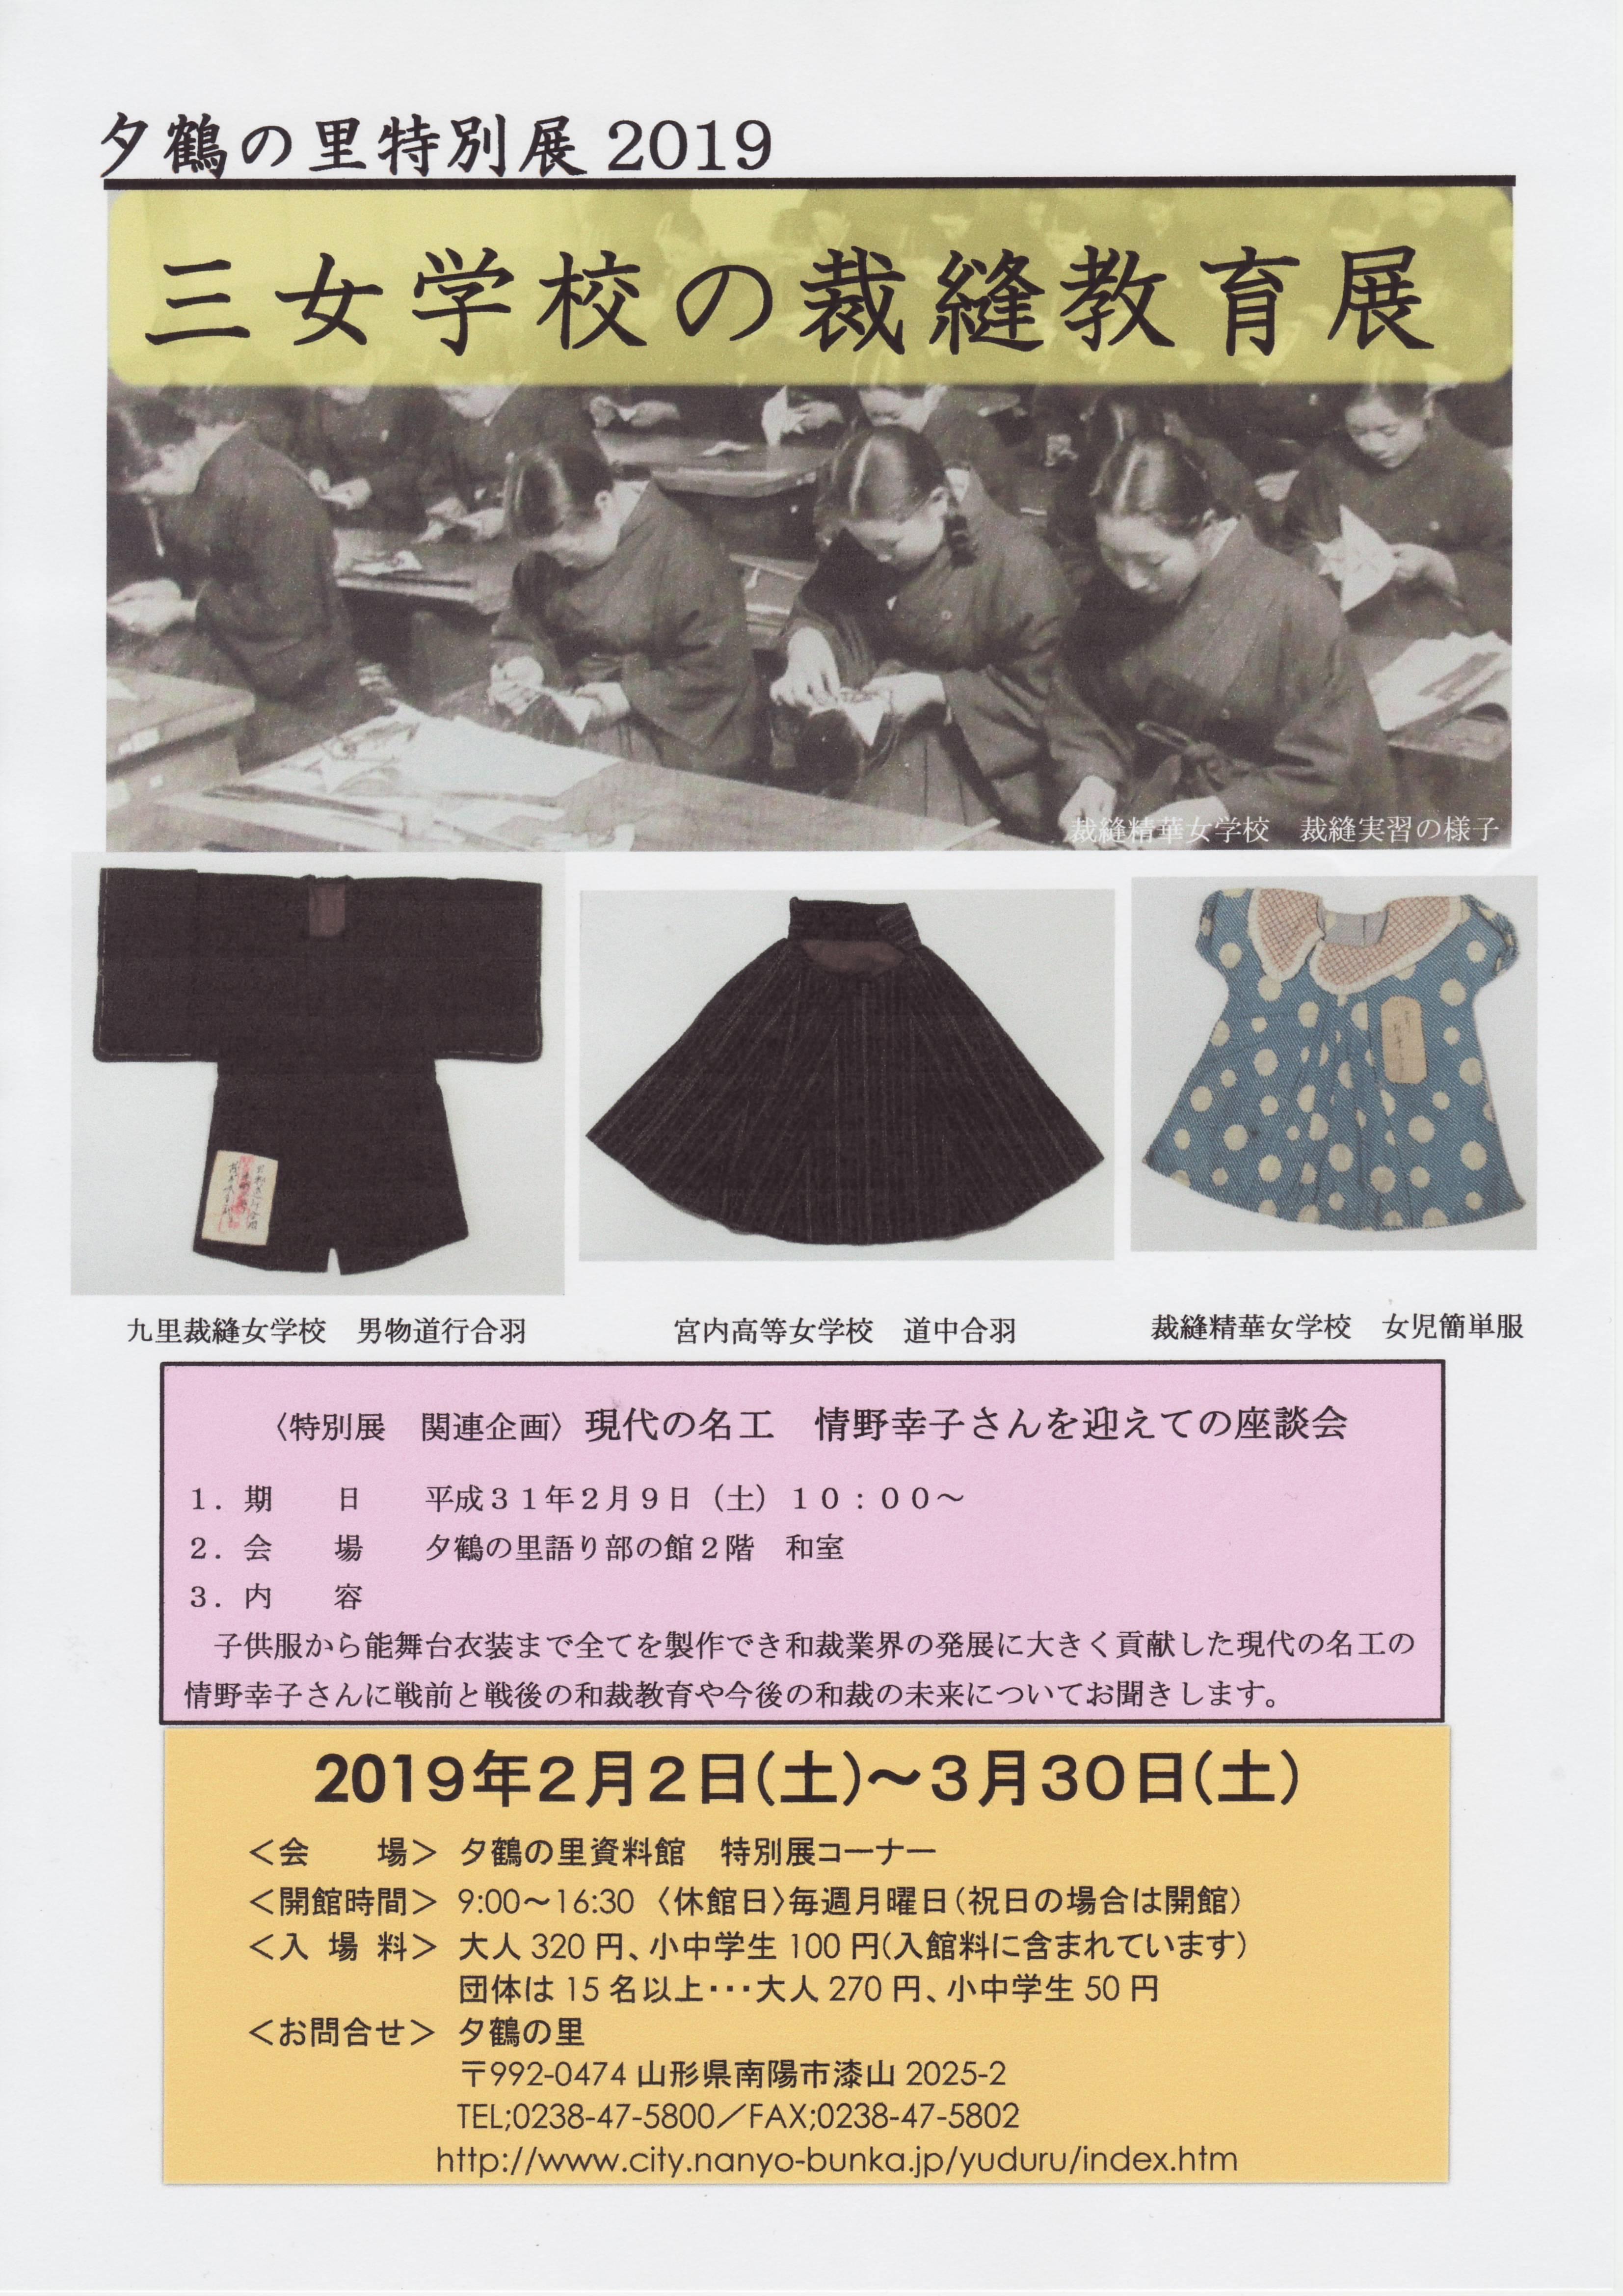 2019 三女裁縫教育展 夕鶴の里 :画像